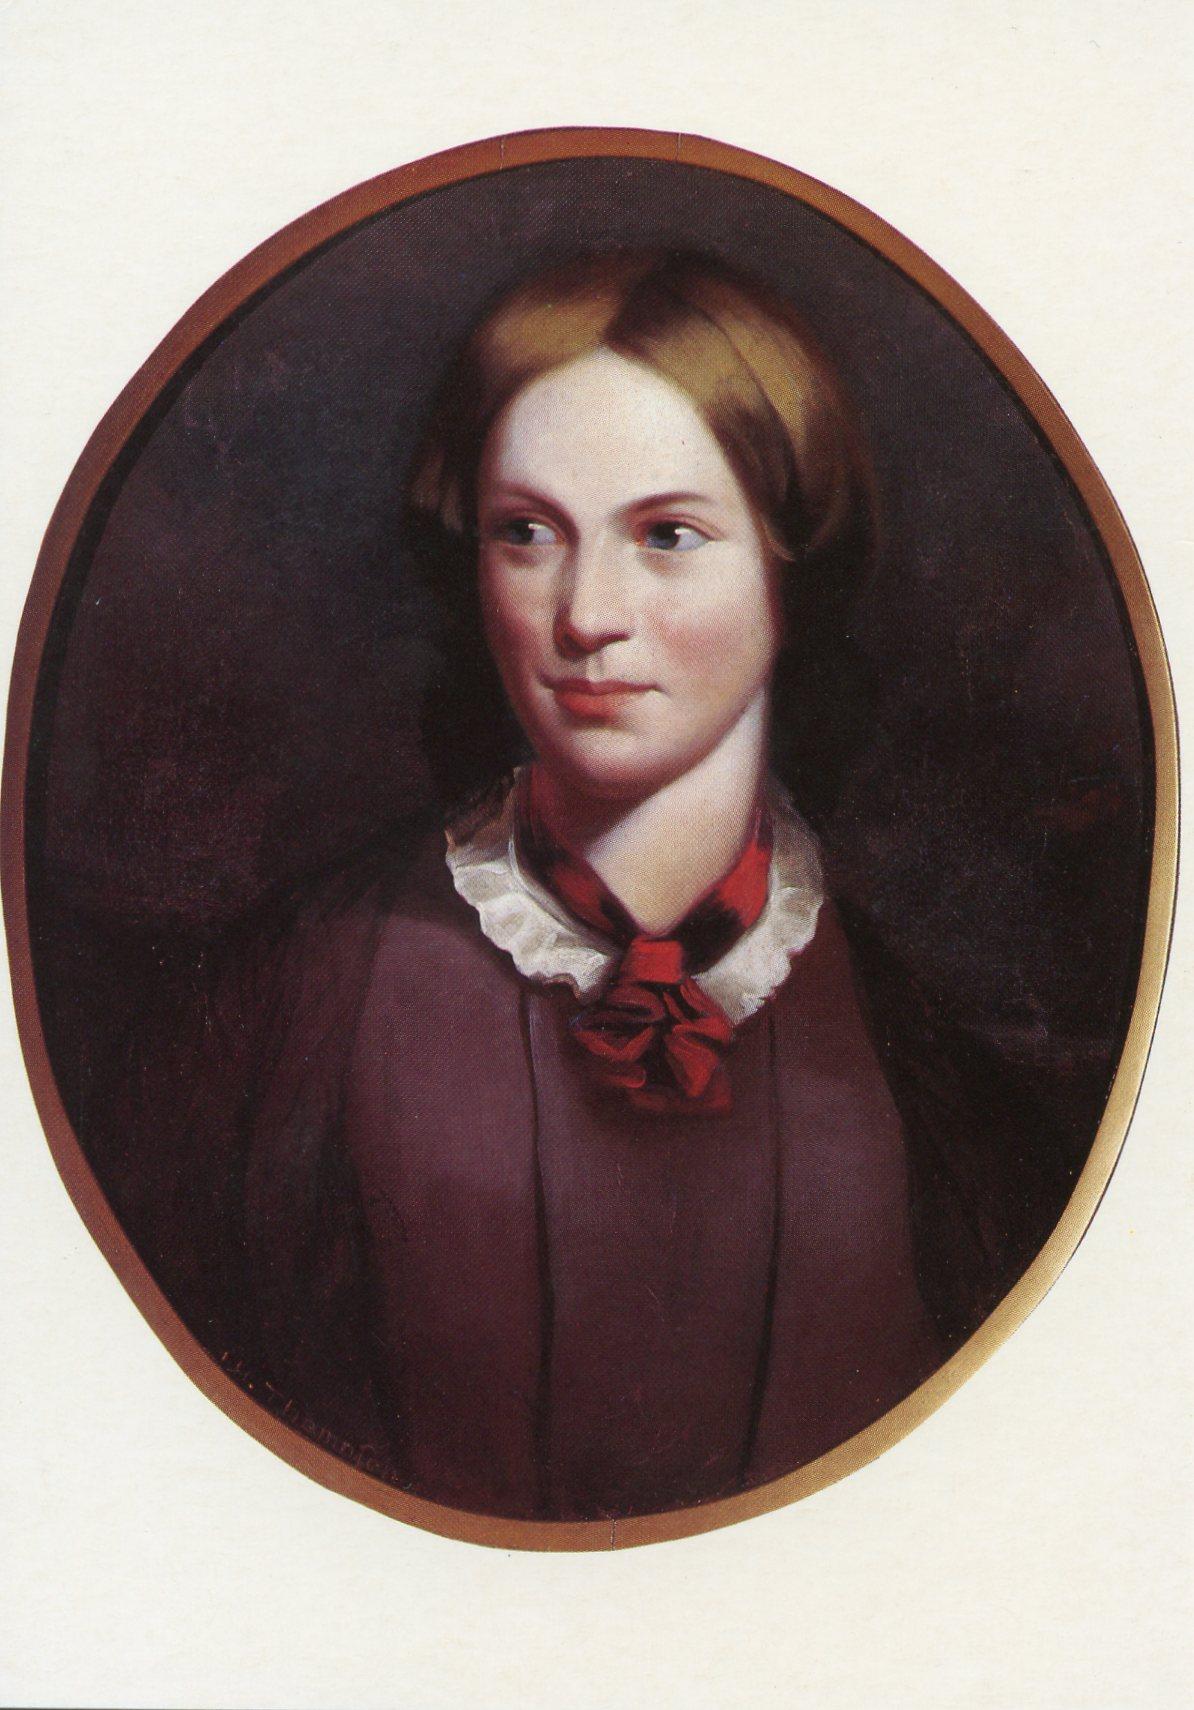 https://upload.wikimedia.org/wikipedia/commons/d/d3/CharlotteBrontePortrait.jpg